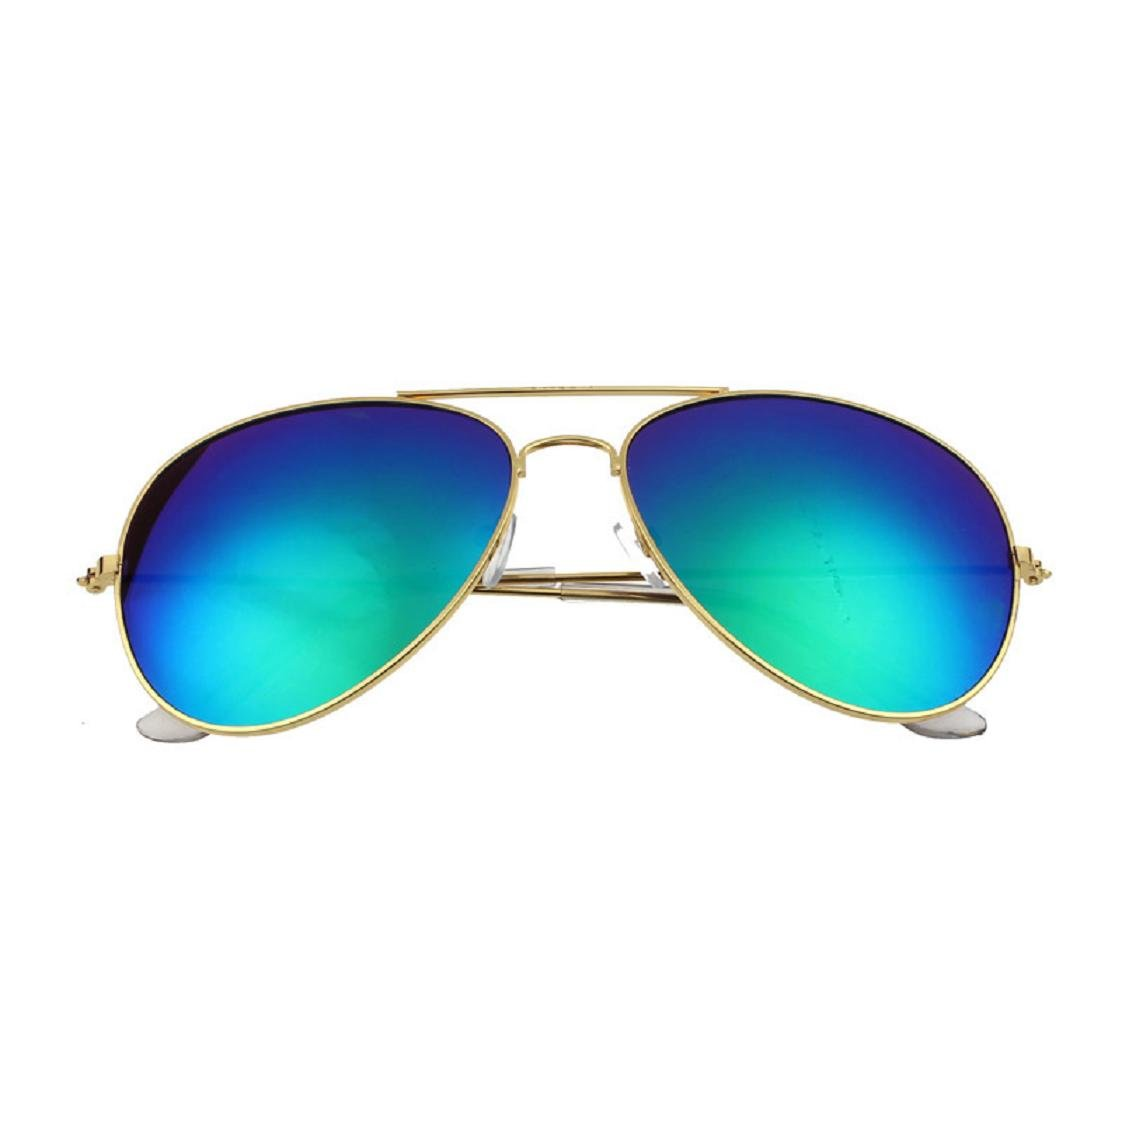 Mchoice Women Men Classic Unisex Retro Sunglasses Metal Frame (Green)